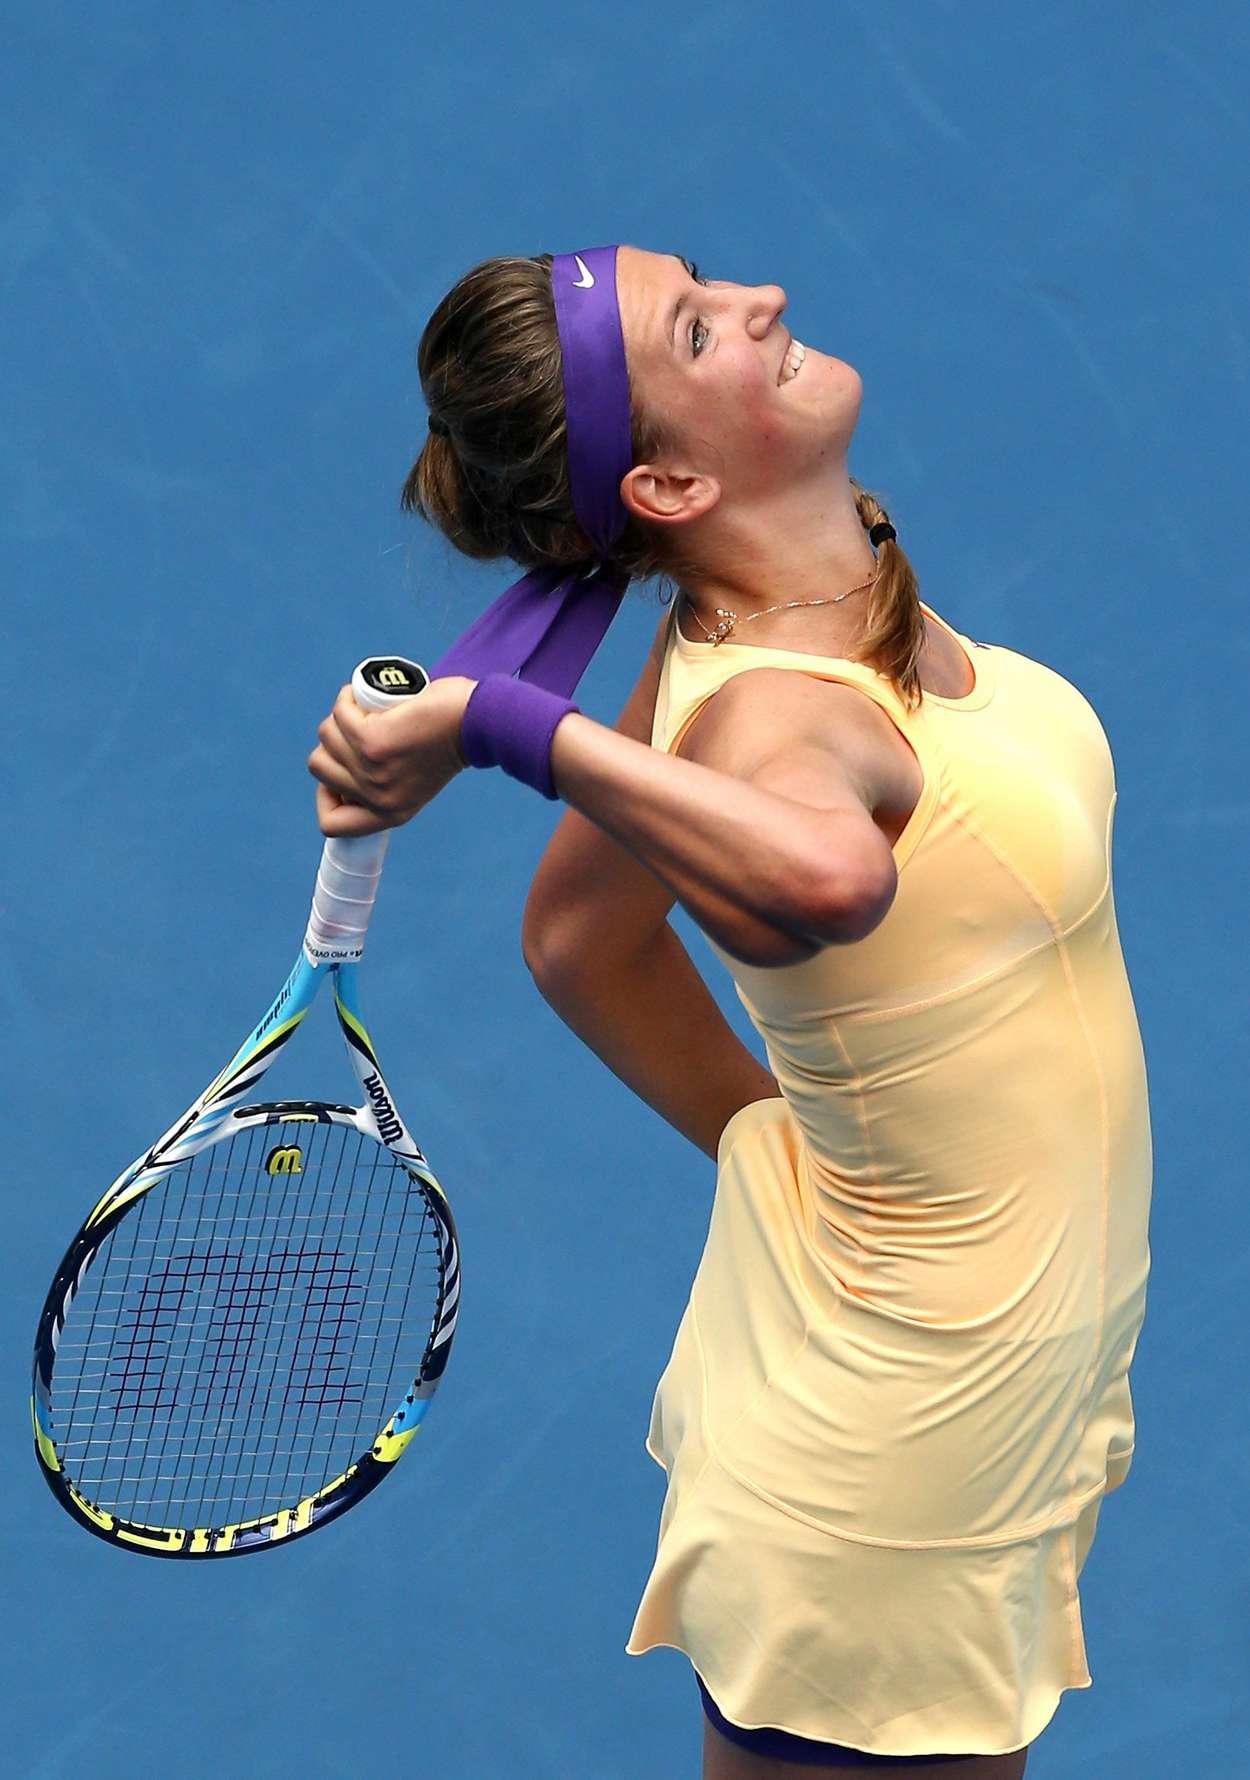 Victoria Azarenka - Australian Open 2013 (Day 4)